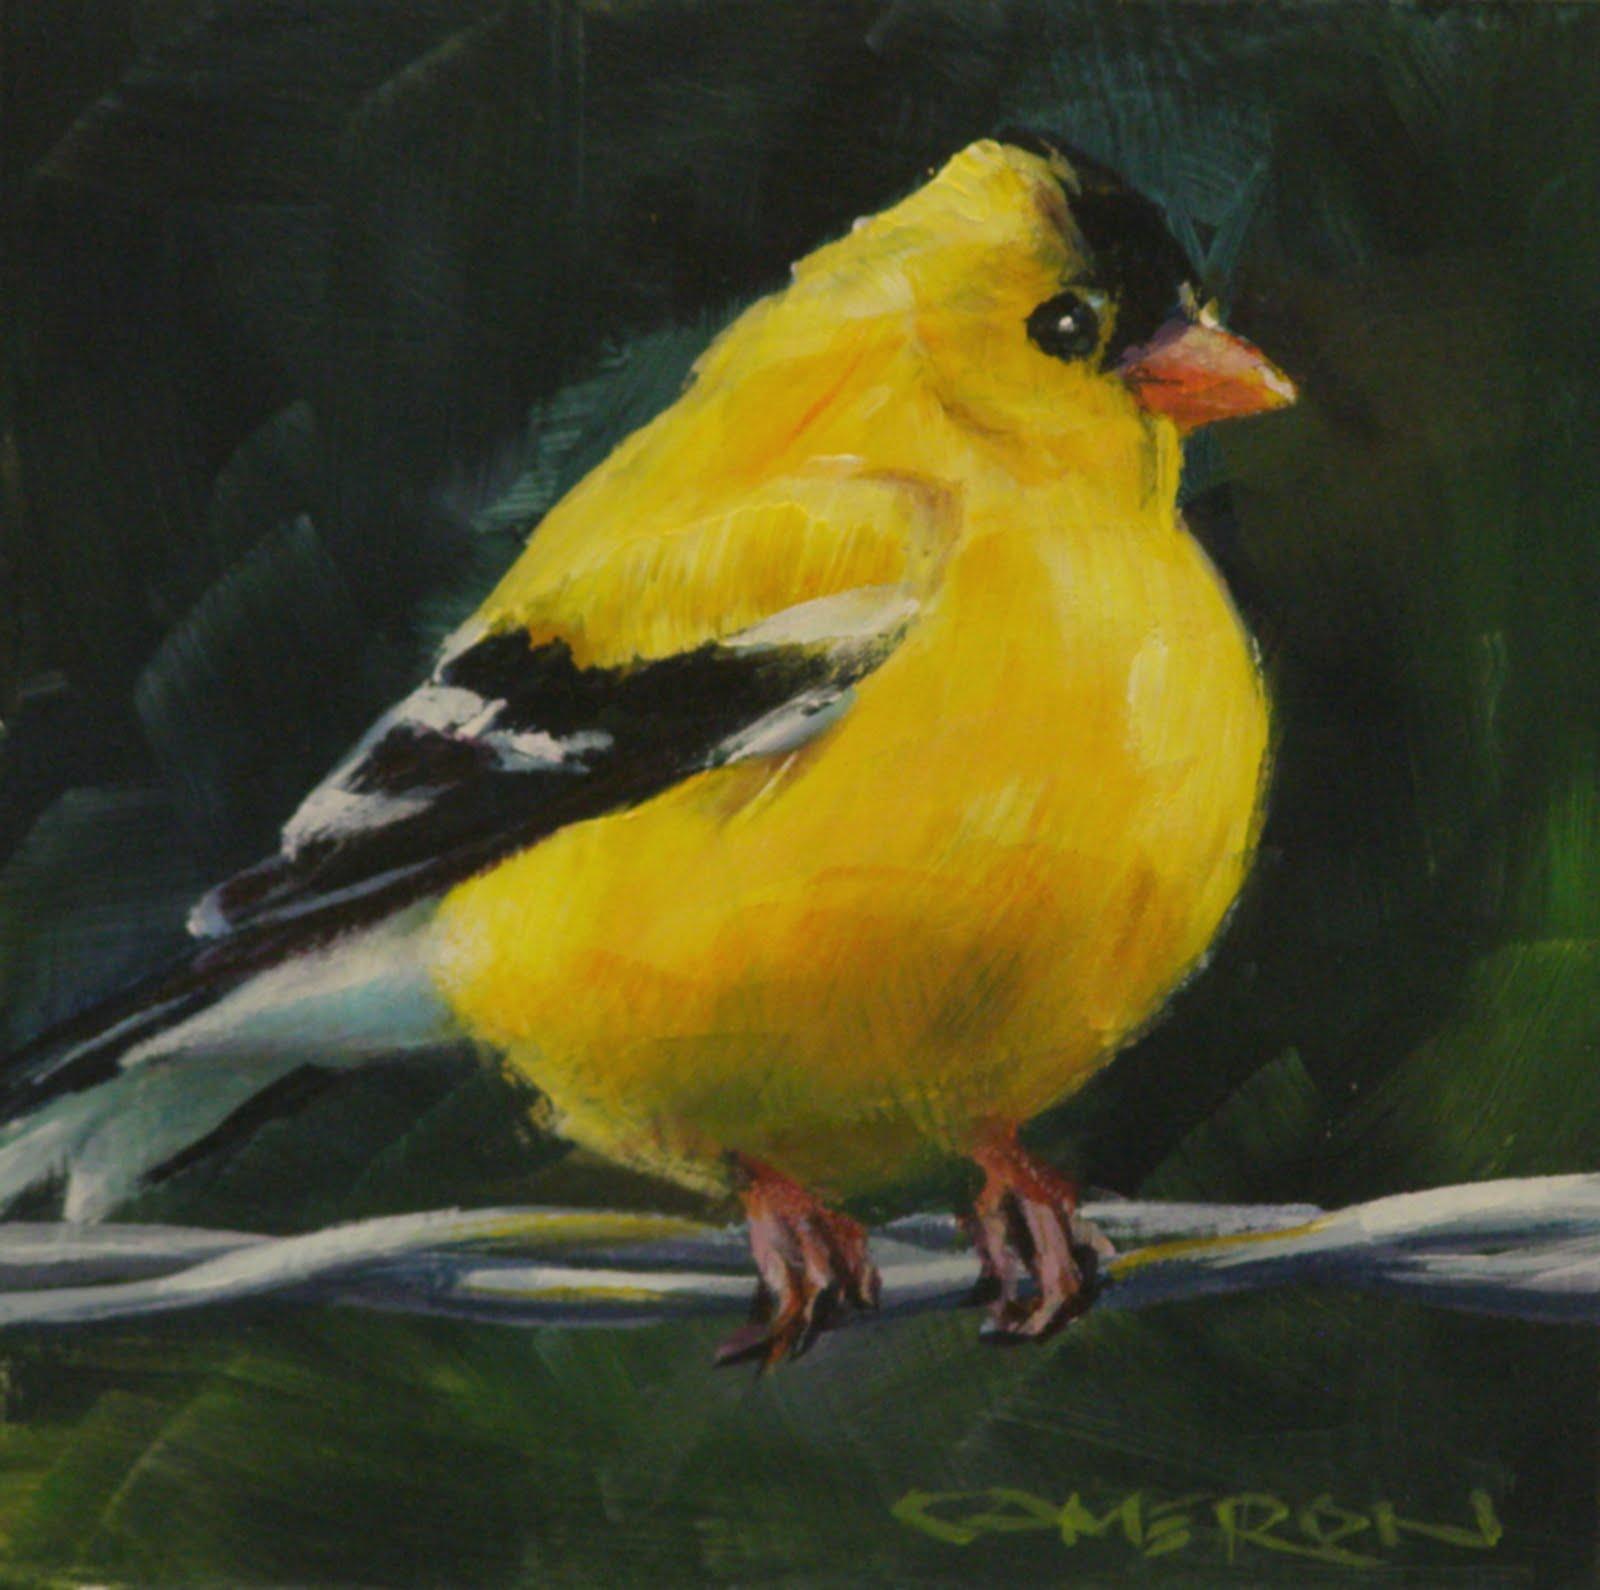 """BIRD ON A WIRE"" original fine art by Brian Cameron"